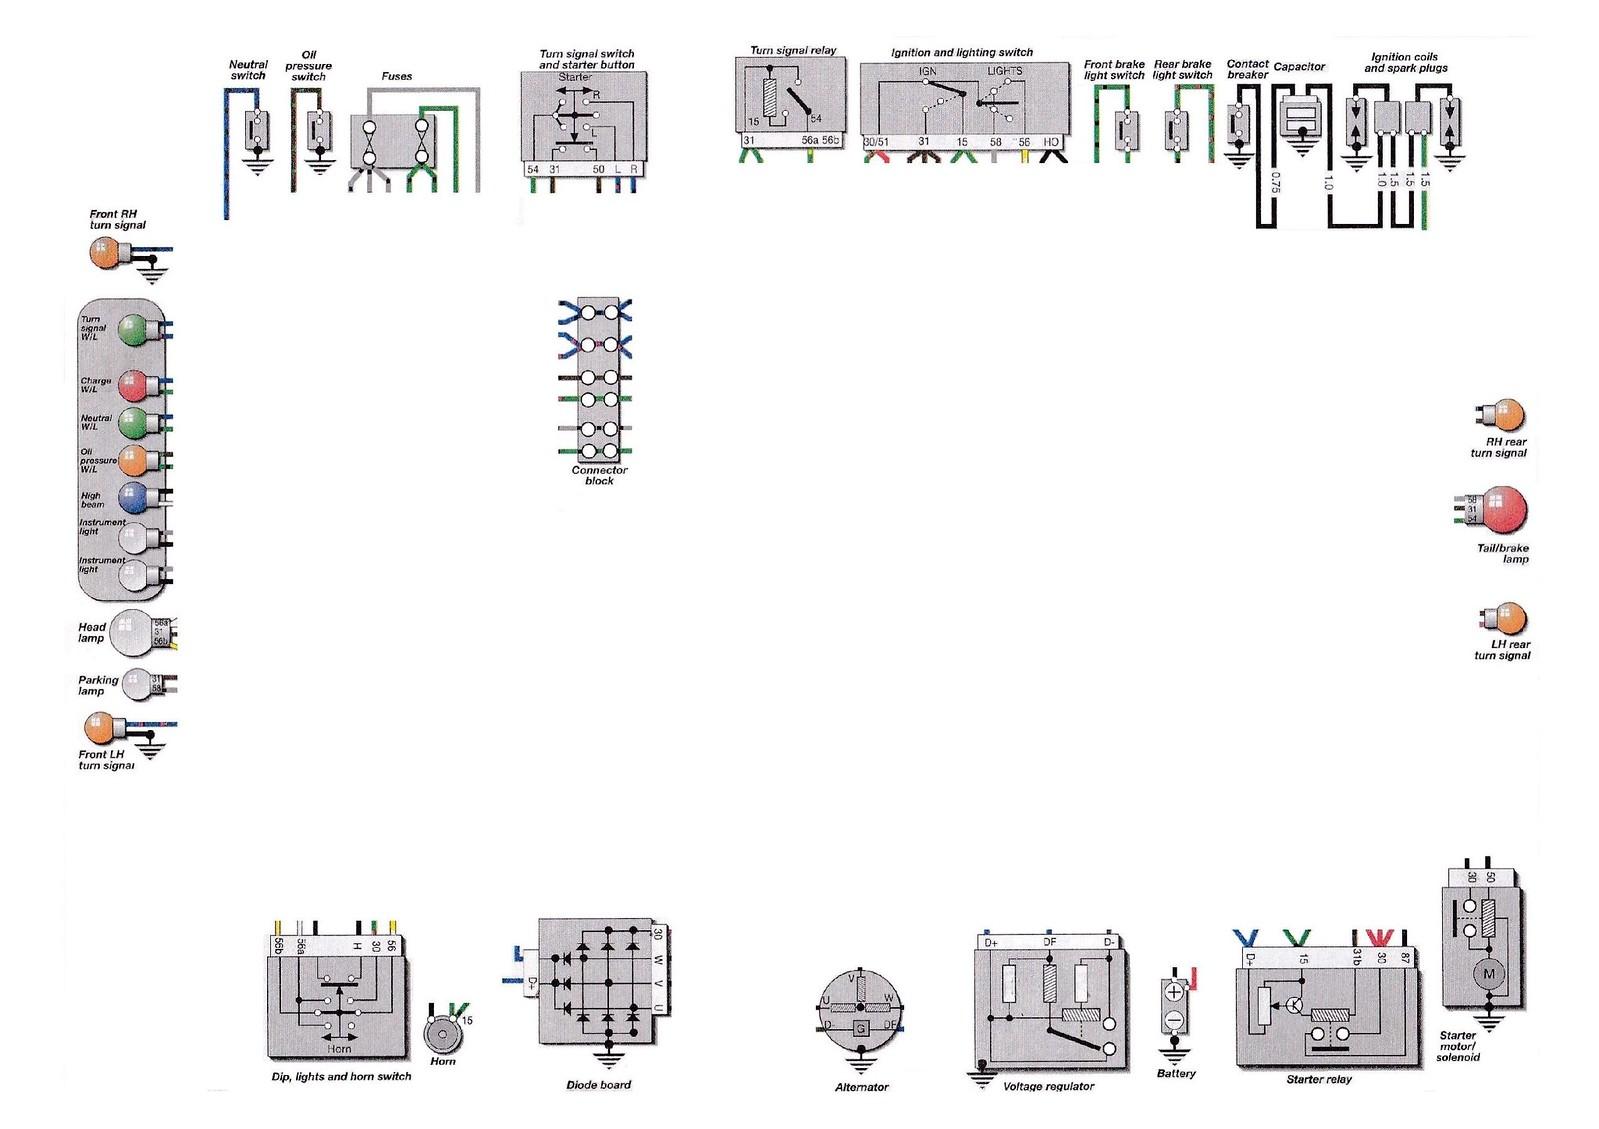 Sensational Wiring Diagram Bmw 650 Gs Bmw K100 Bmw 850 Gs Bmw F 700 Gs Bmw Wiring Digital Resources Hetepmognl